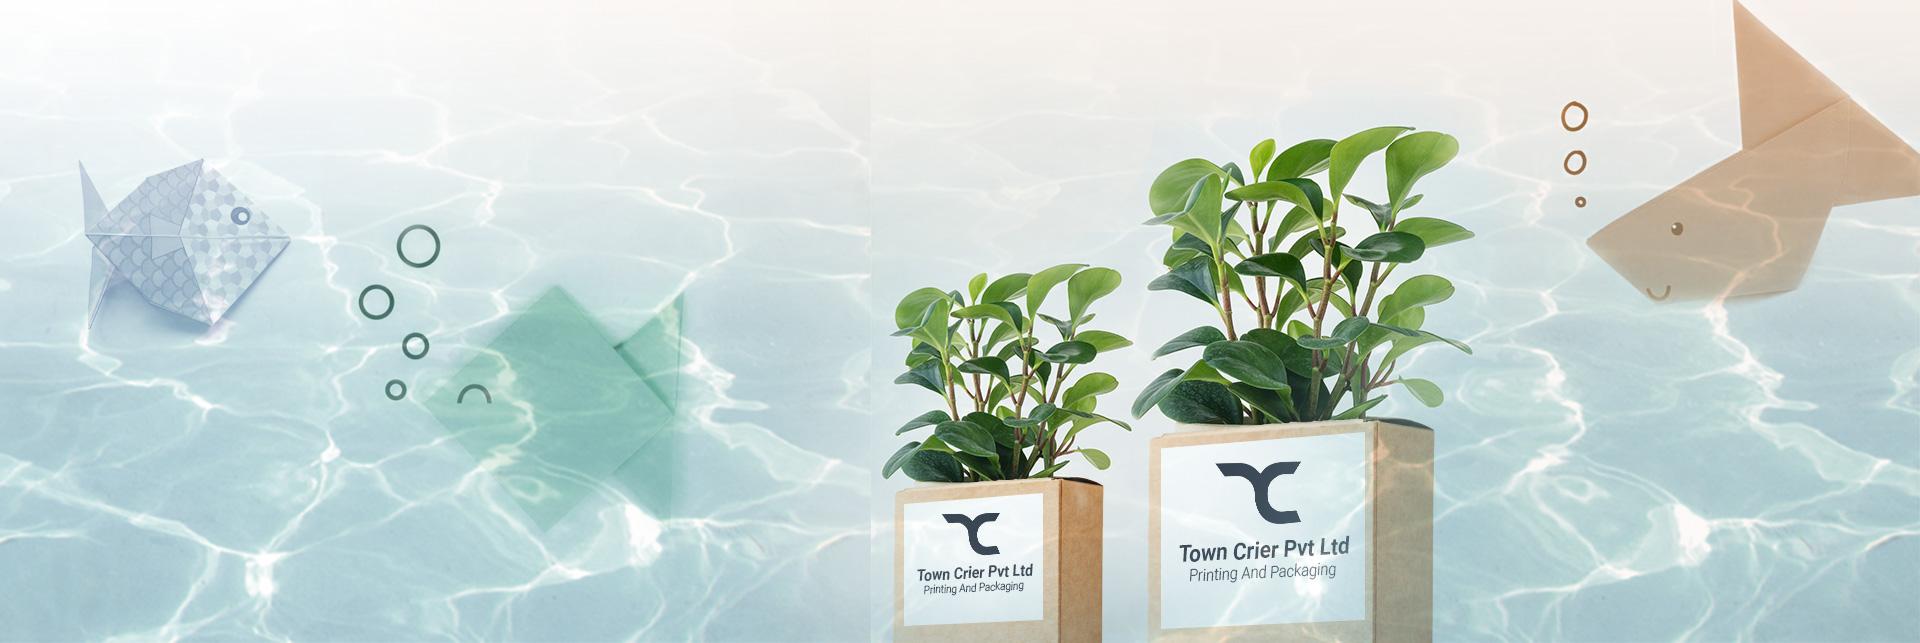 Town Crier Pvt Ltd-Eco Friendly Packaging